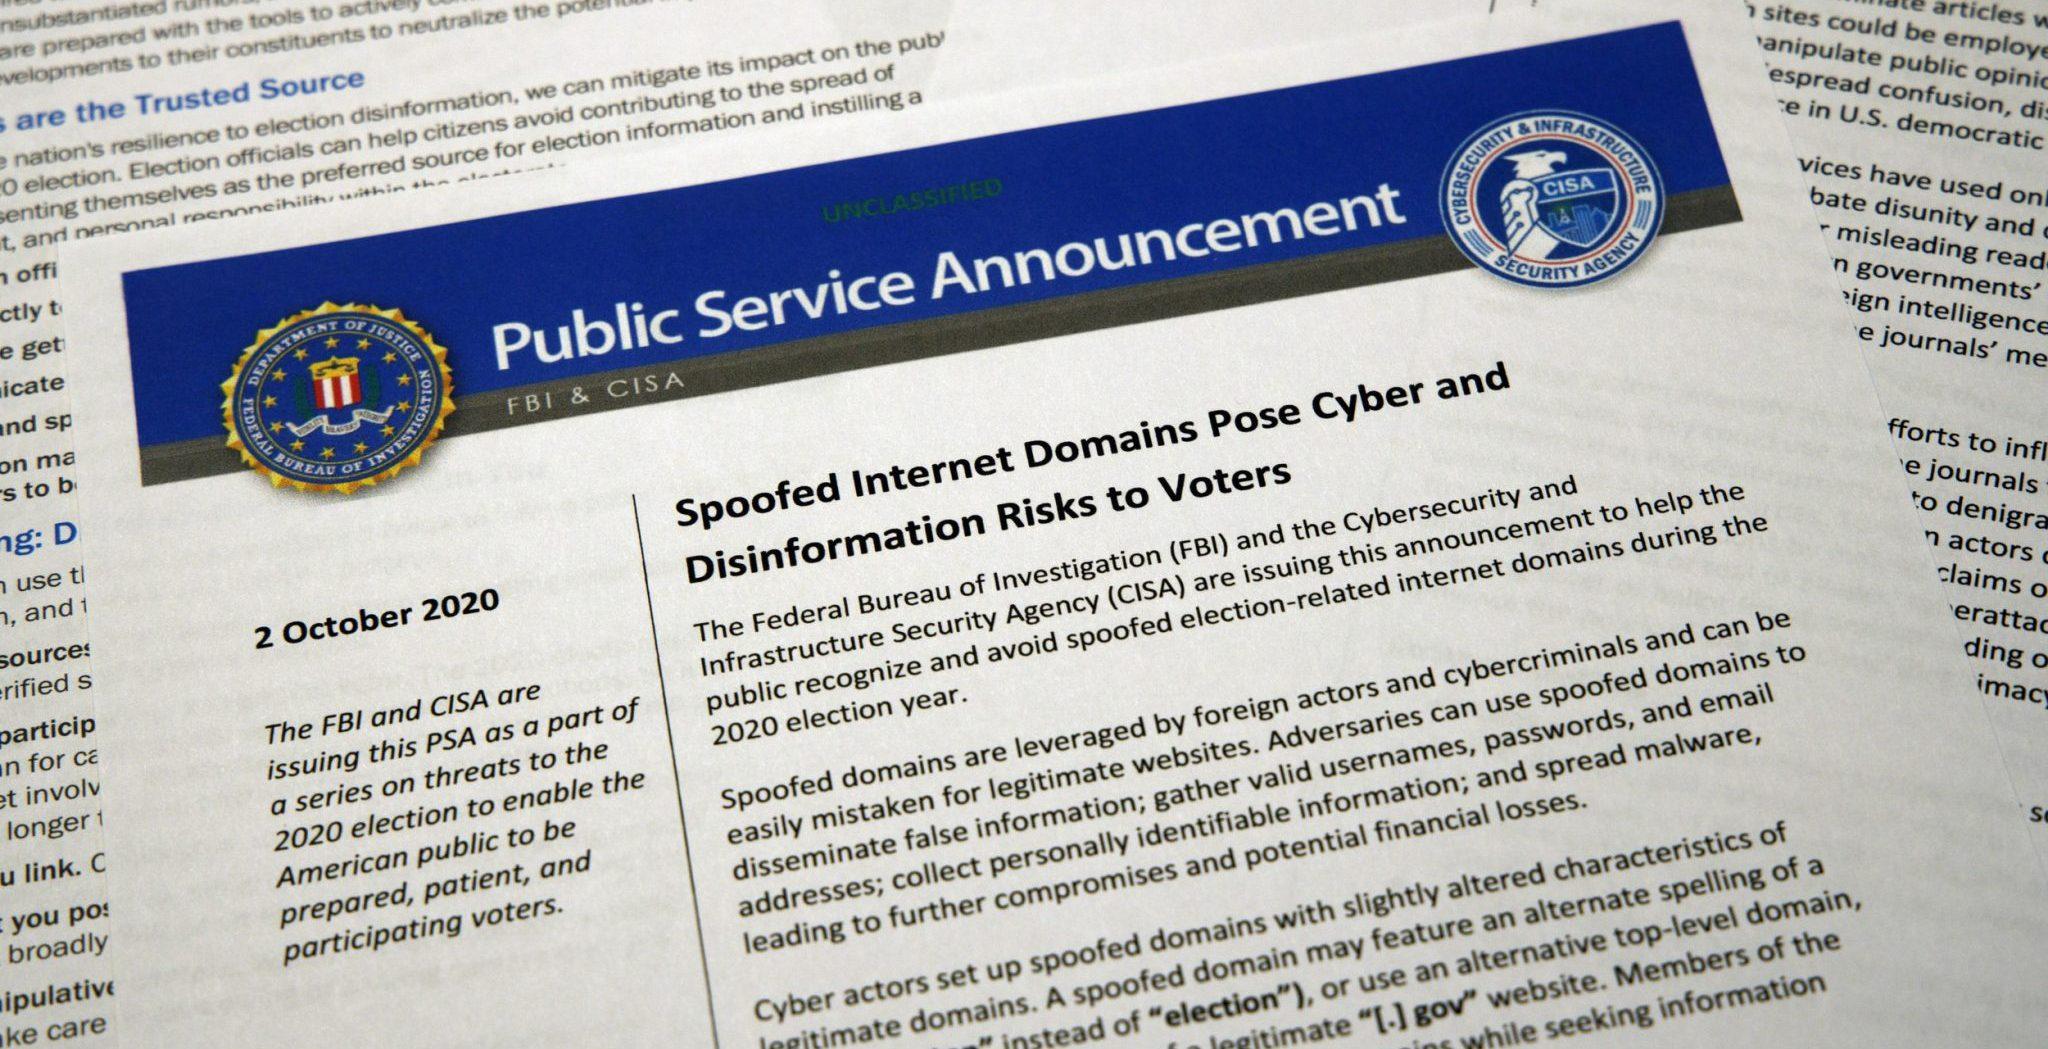 Voter beware: US tells public how to avoid election mischief